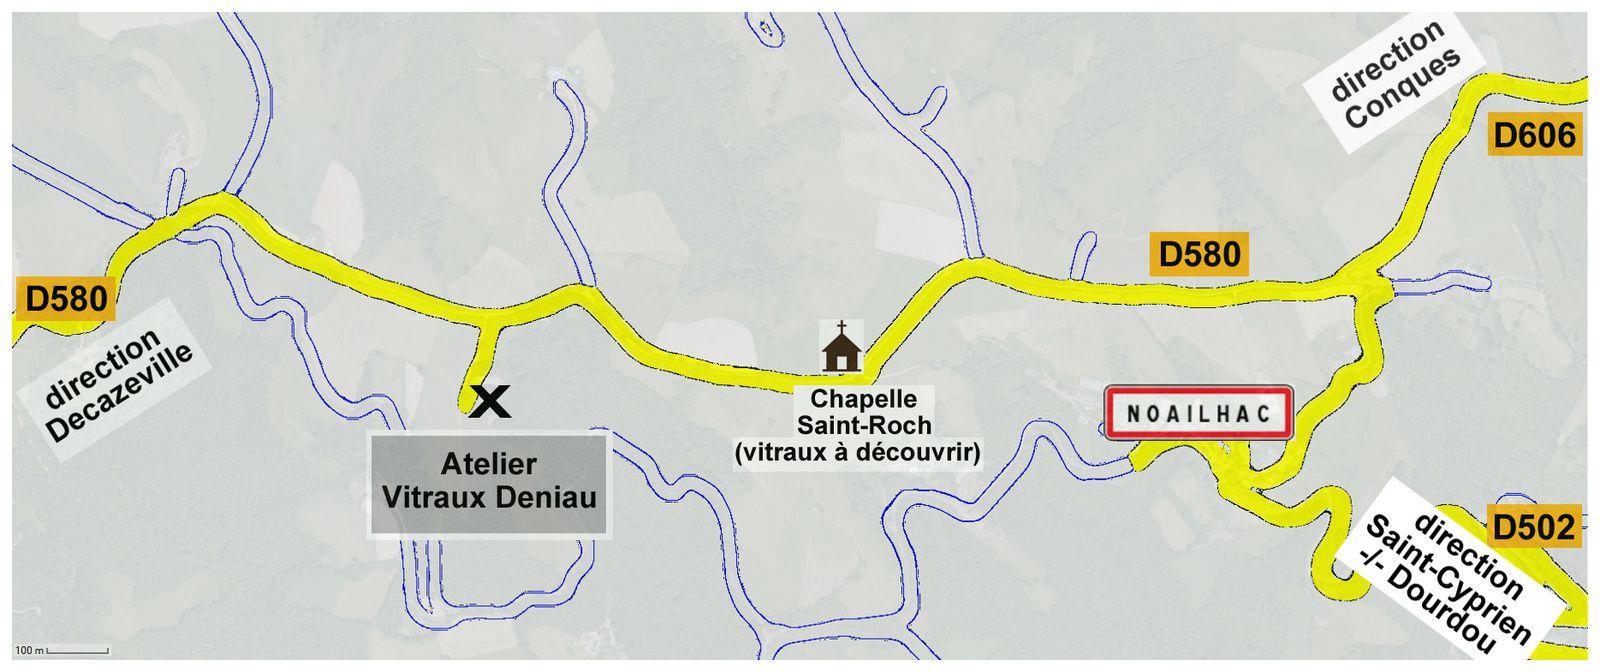 Atelier Deniau Noailhac